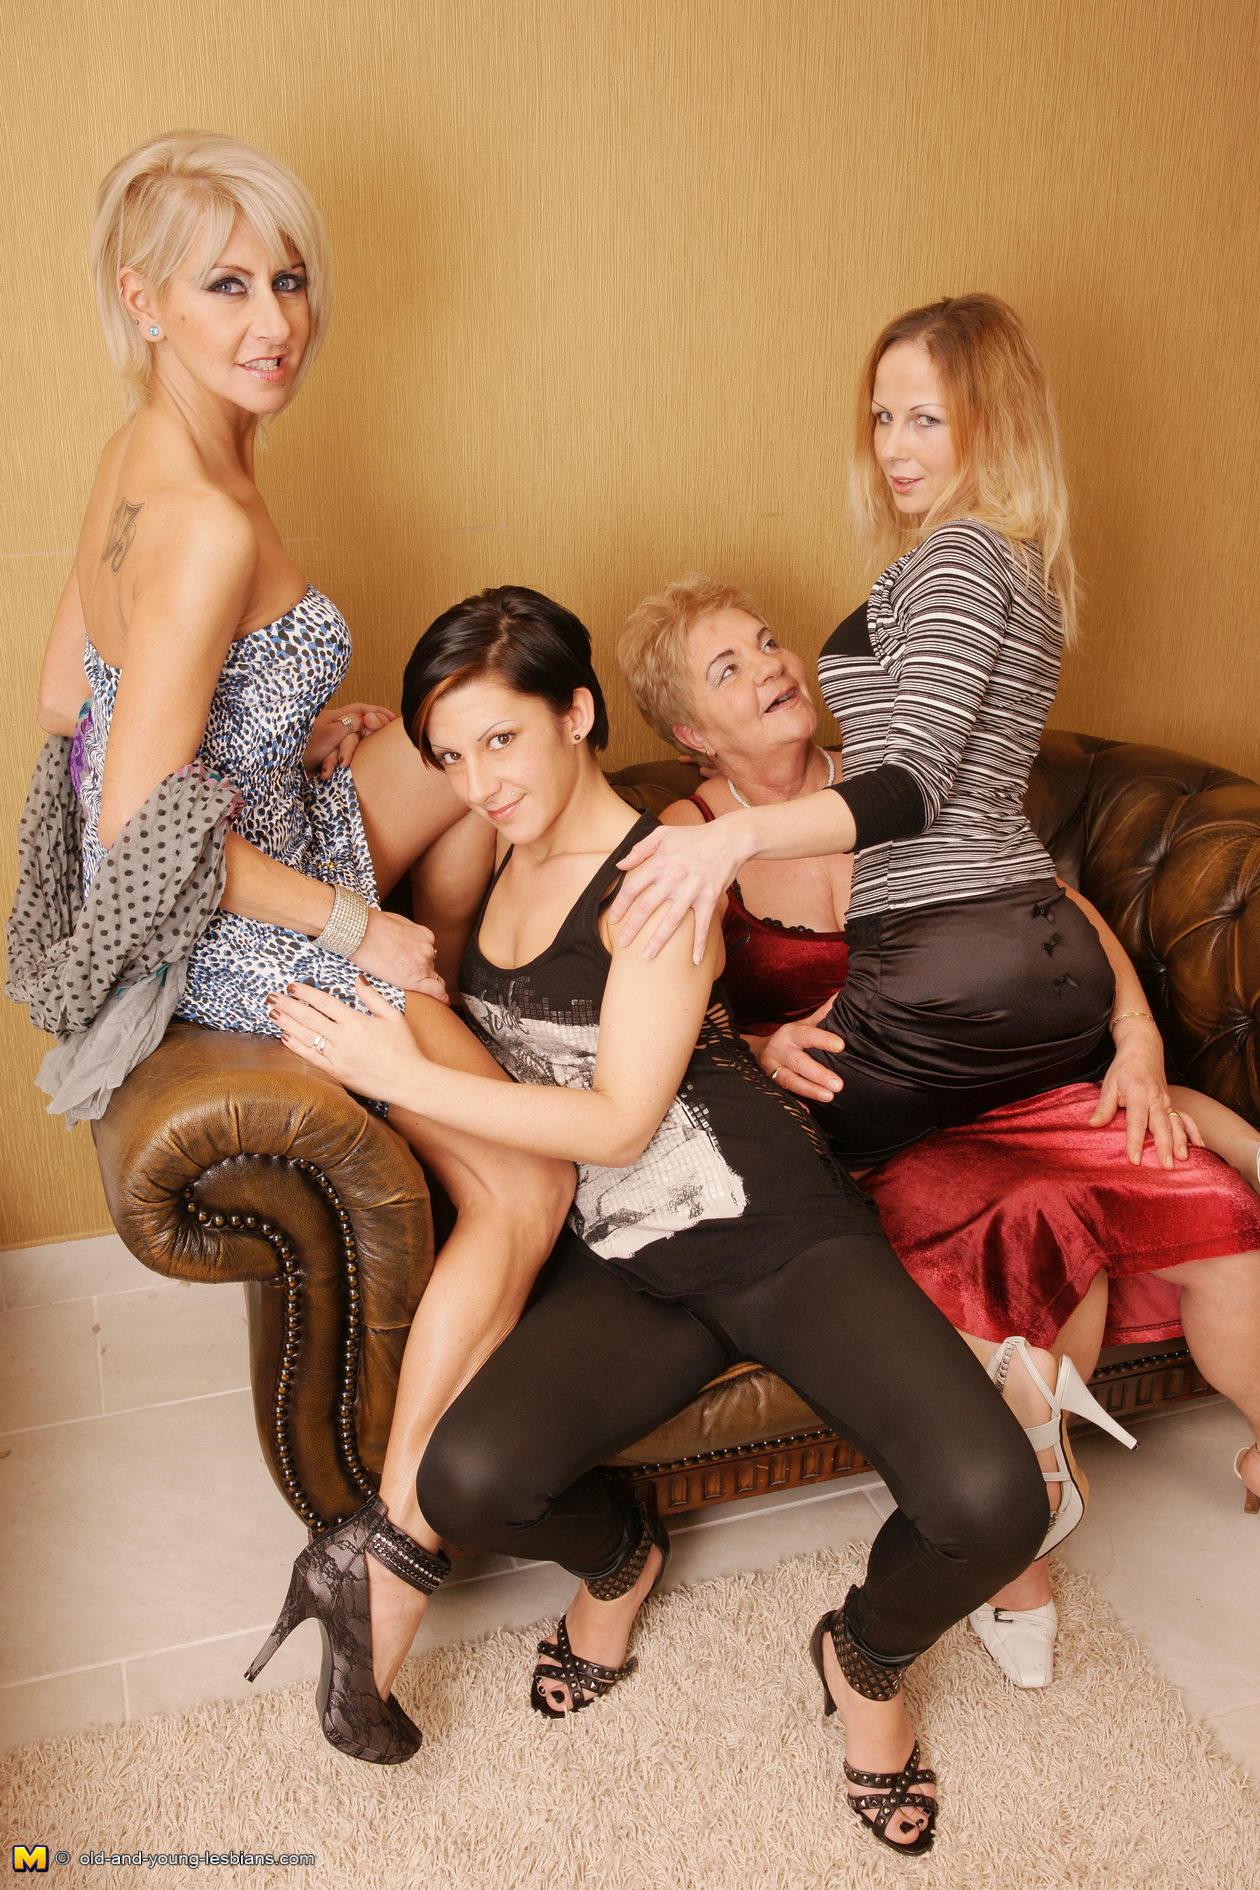 Four lesbians friends in sex 2